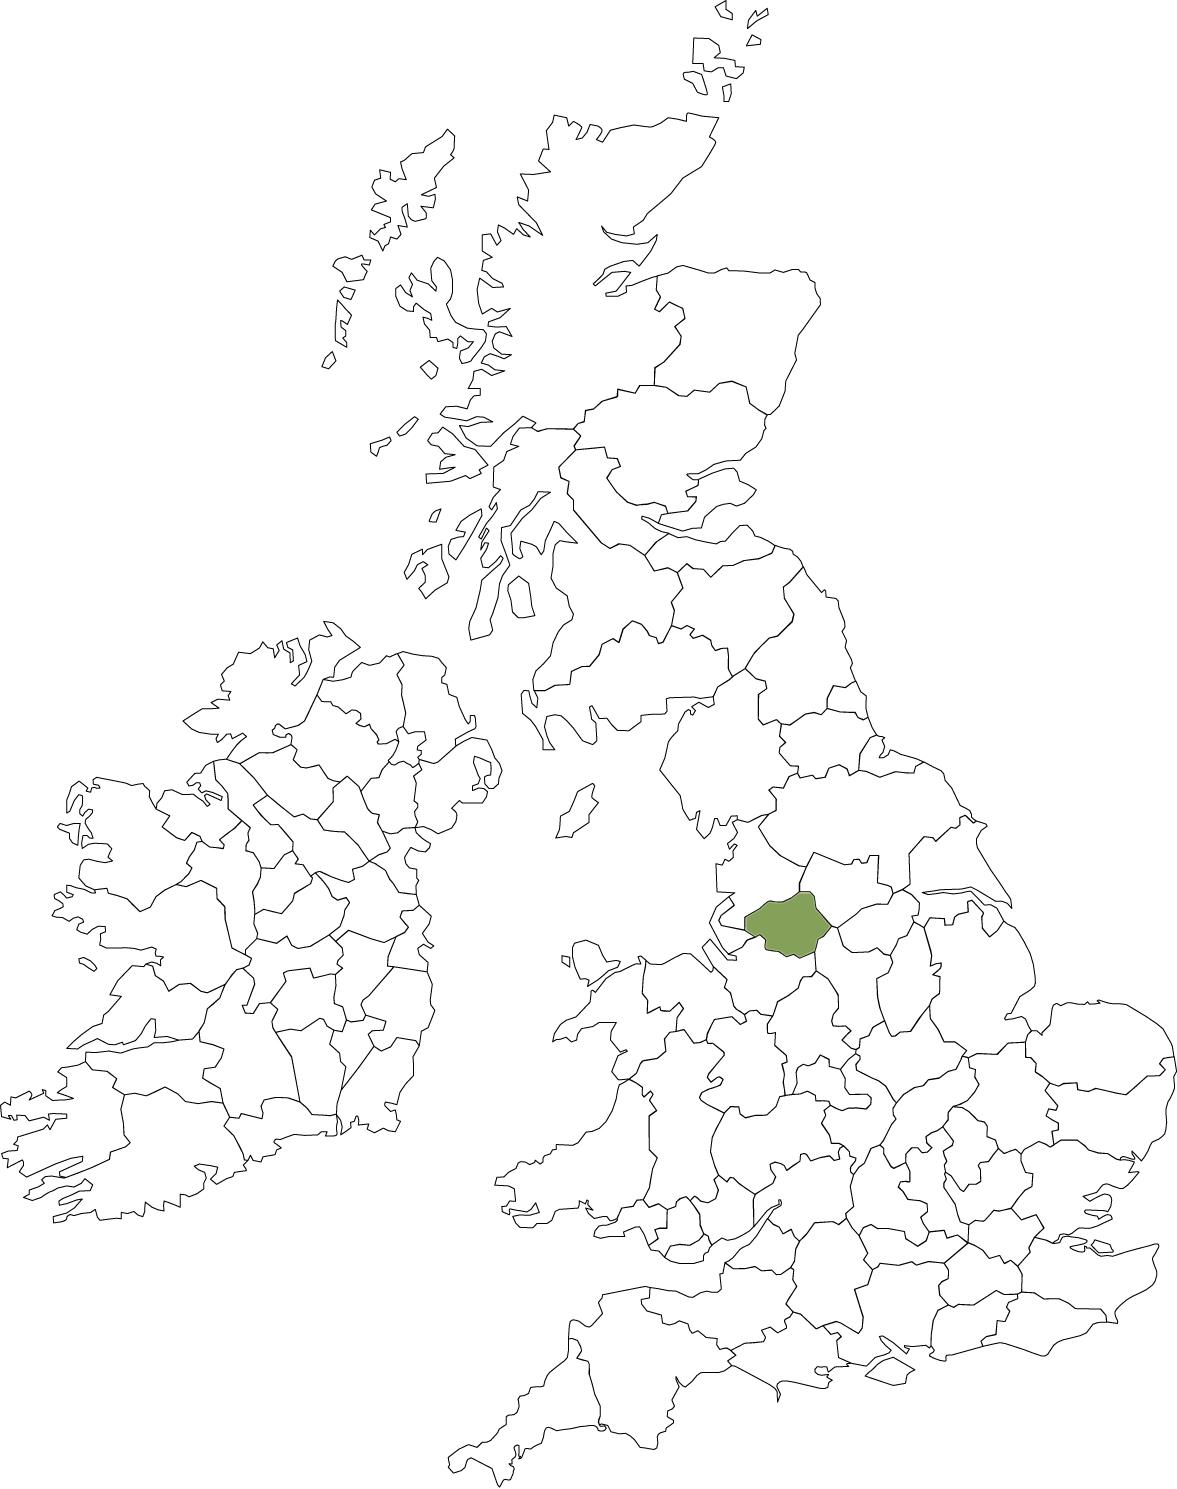 Outline UK map